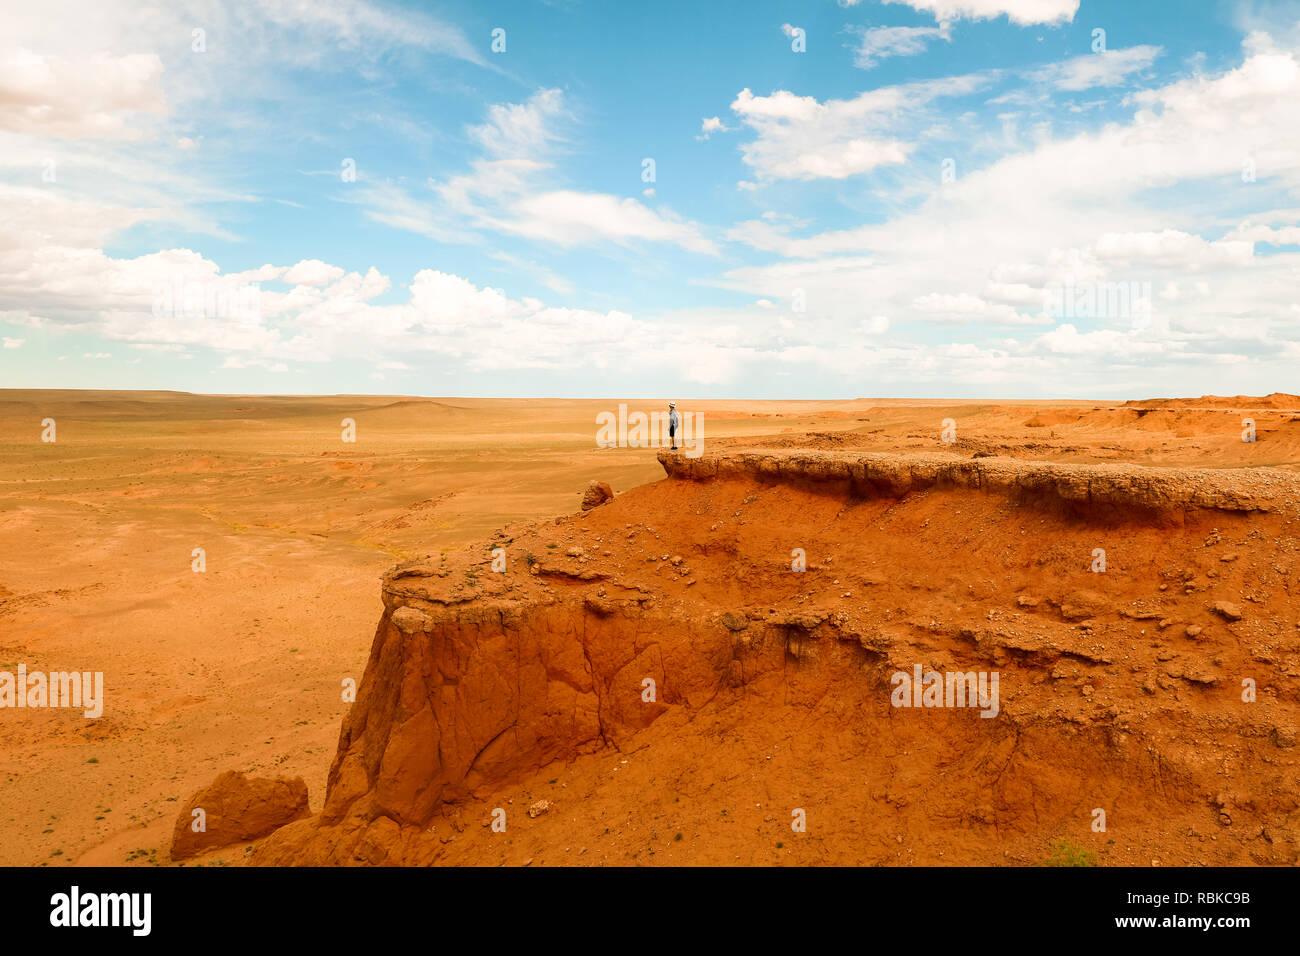 Traveller overseeing the endless Gobi Desert from Bajandsag (Flaming Cliffs) on a beautiful summer day (Gobi Desert, Mongolia, Asia) - Stock Image